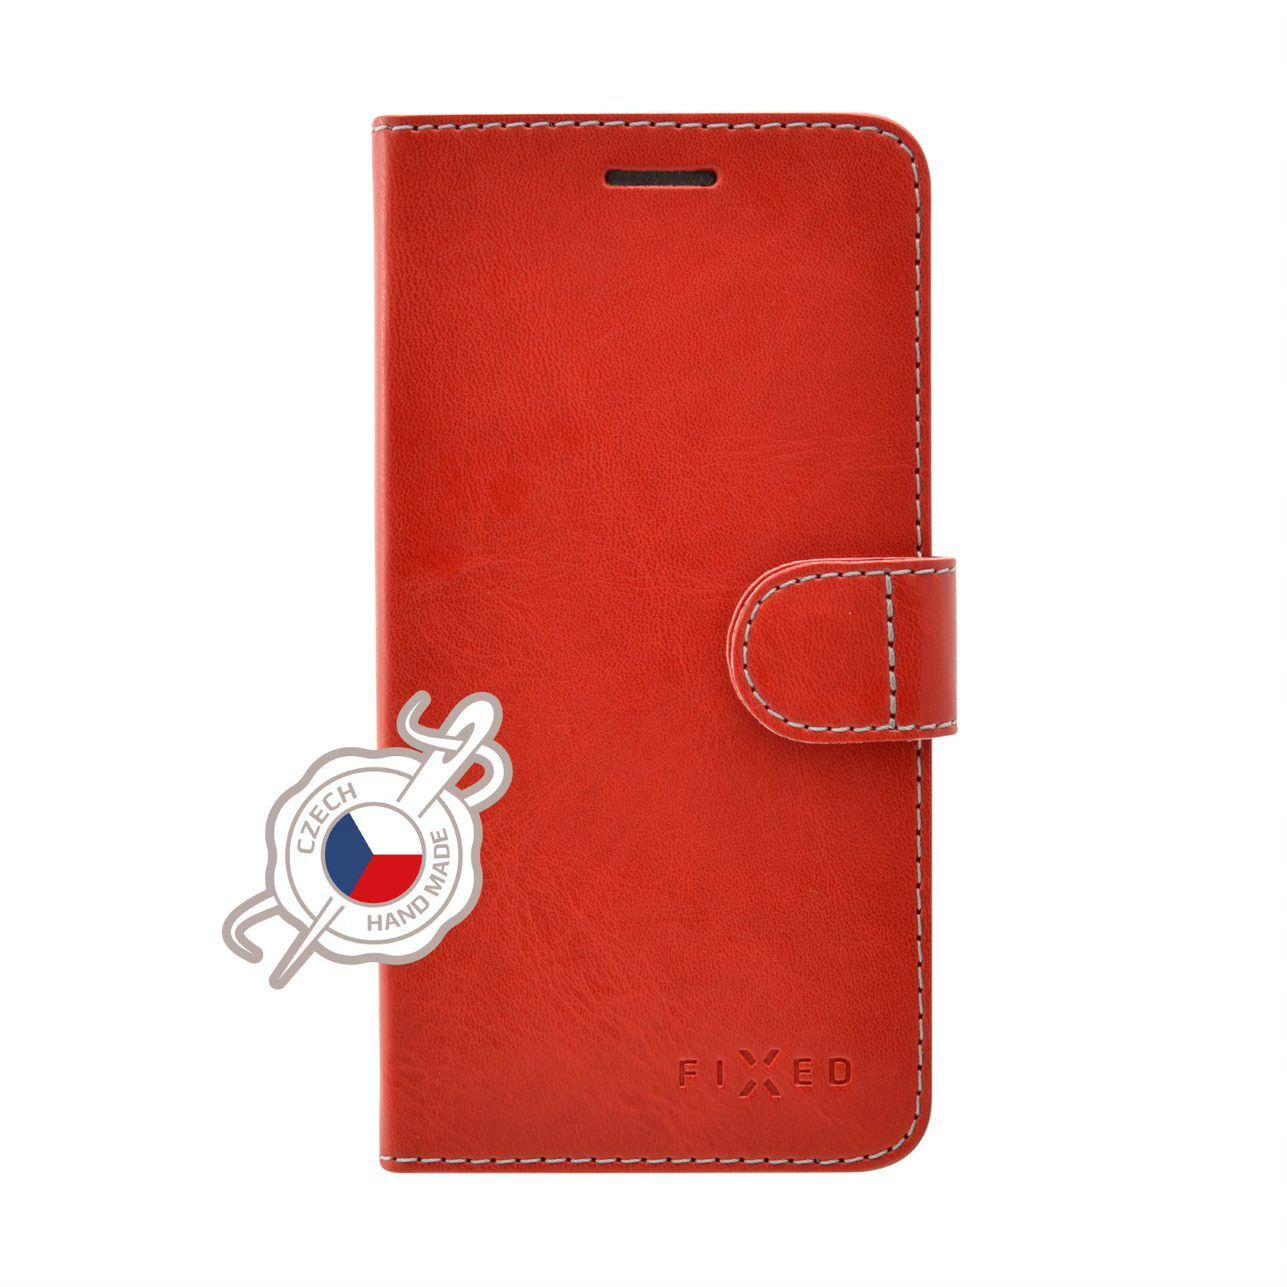 Pouzdro typu kniha FIXED FIT pro Huawei Nova 3i, červené